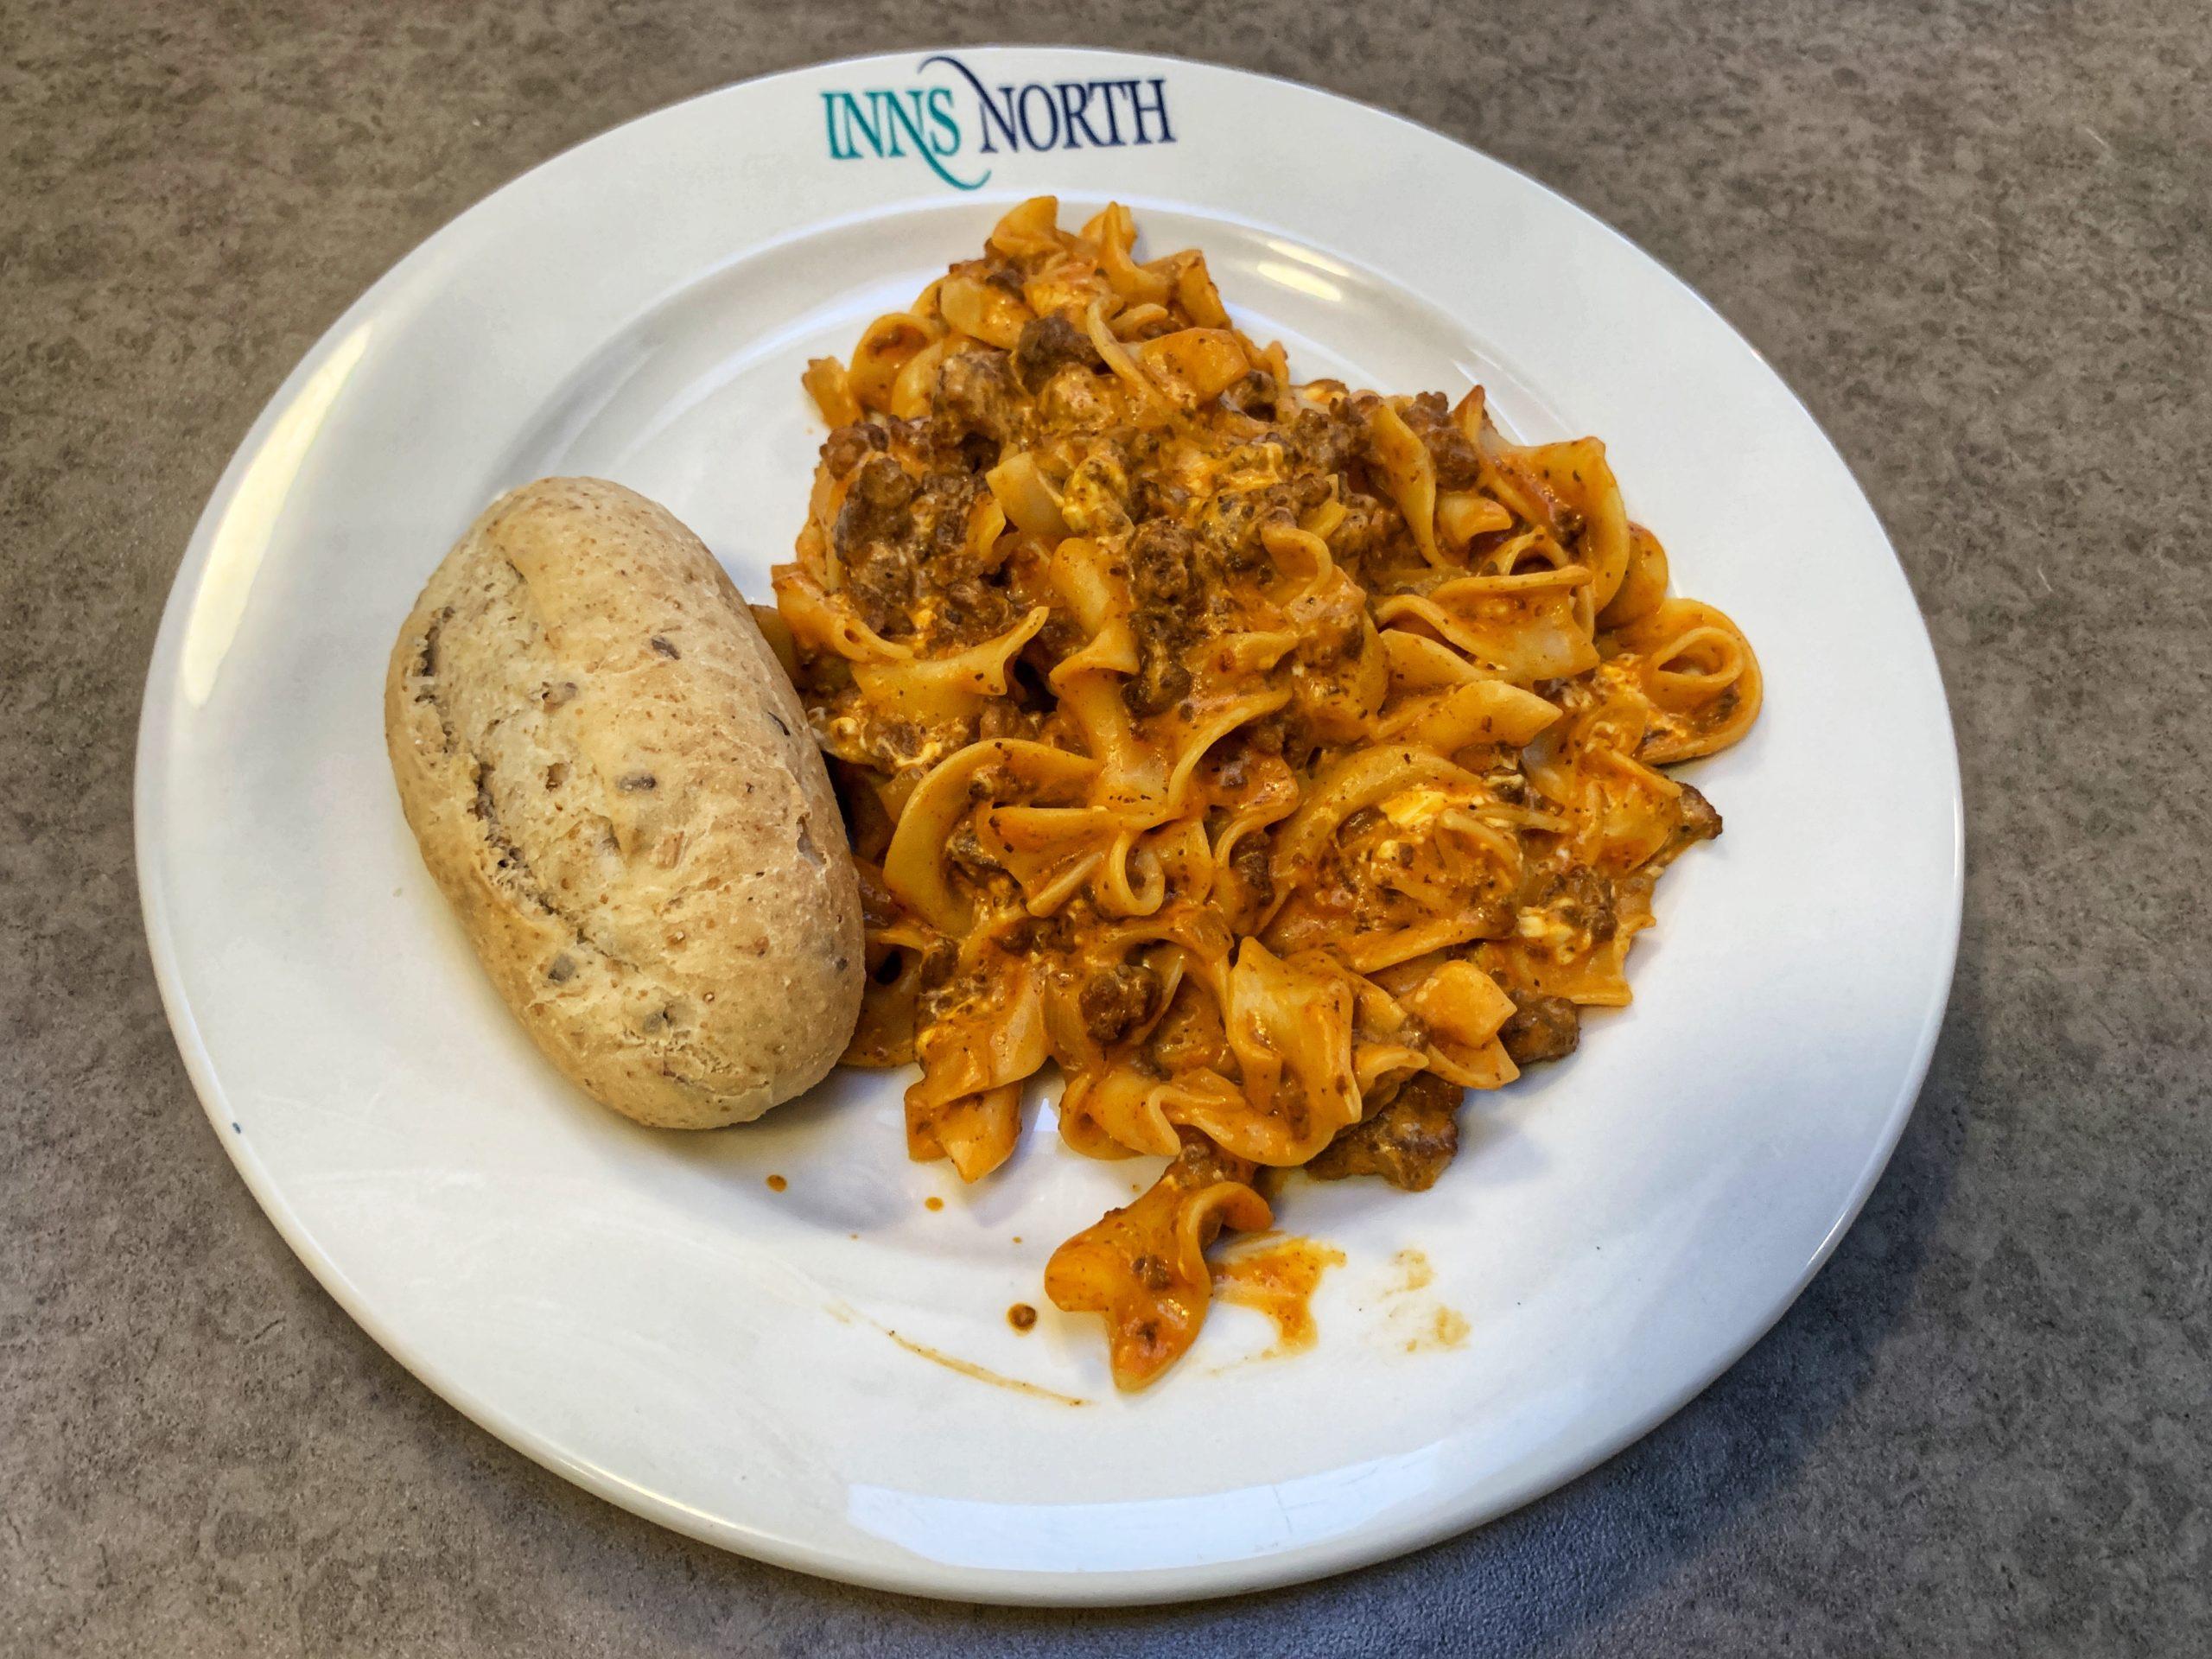 Comfort Cooking: Nunavut Noodles